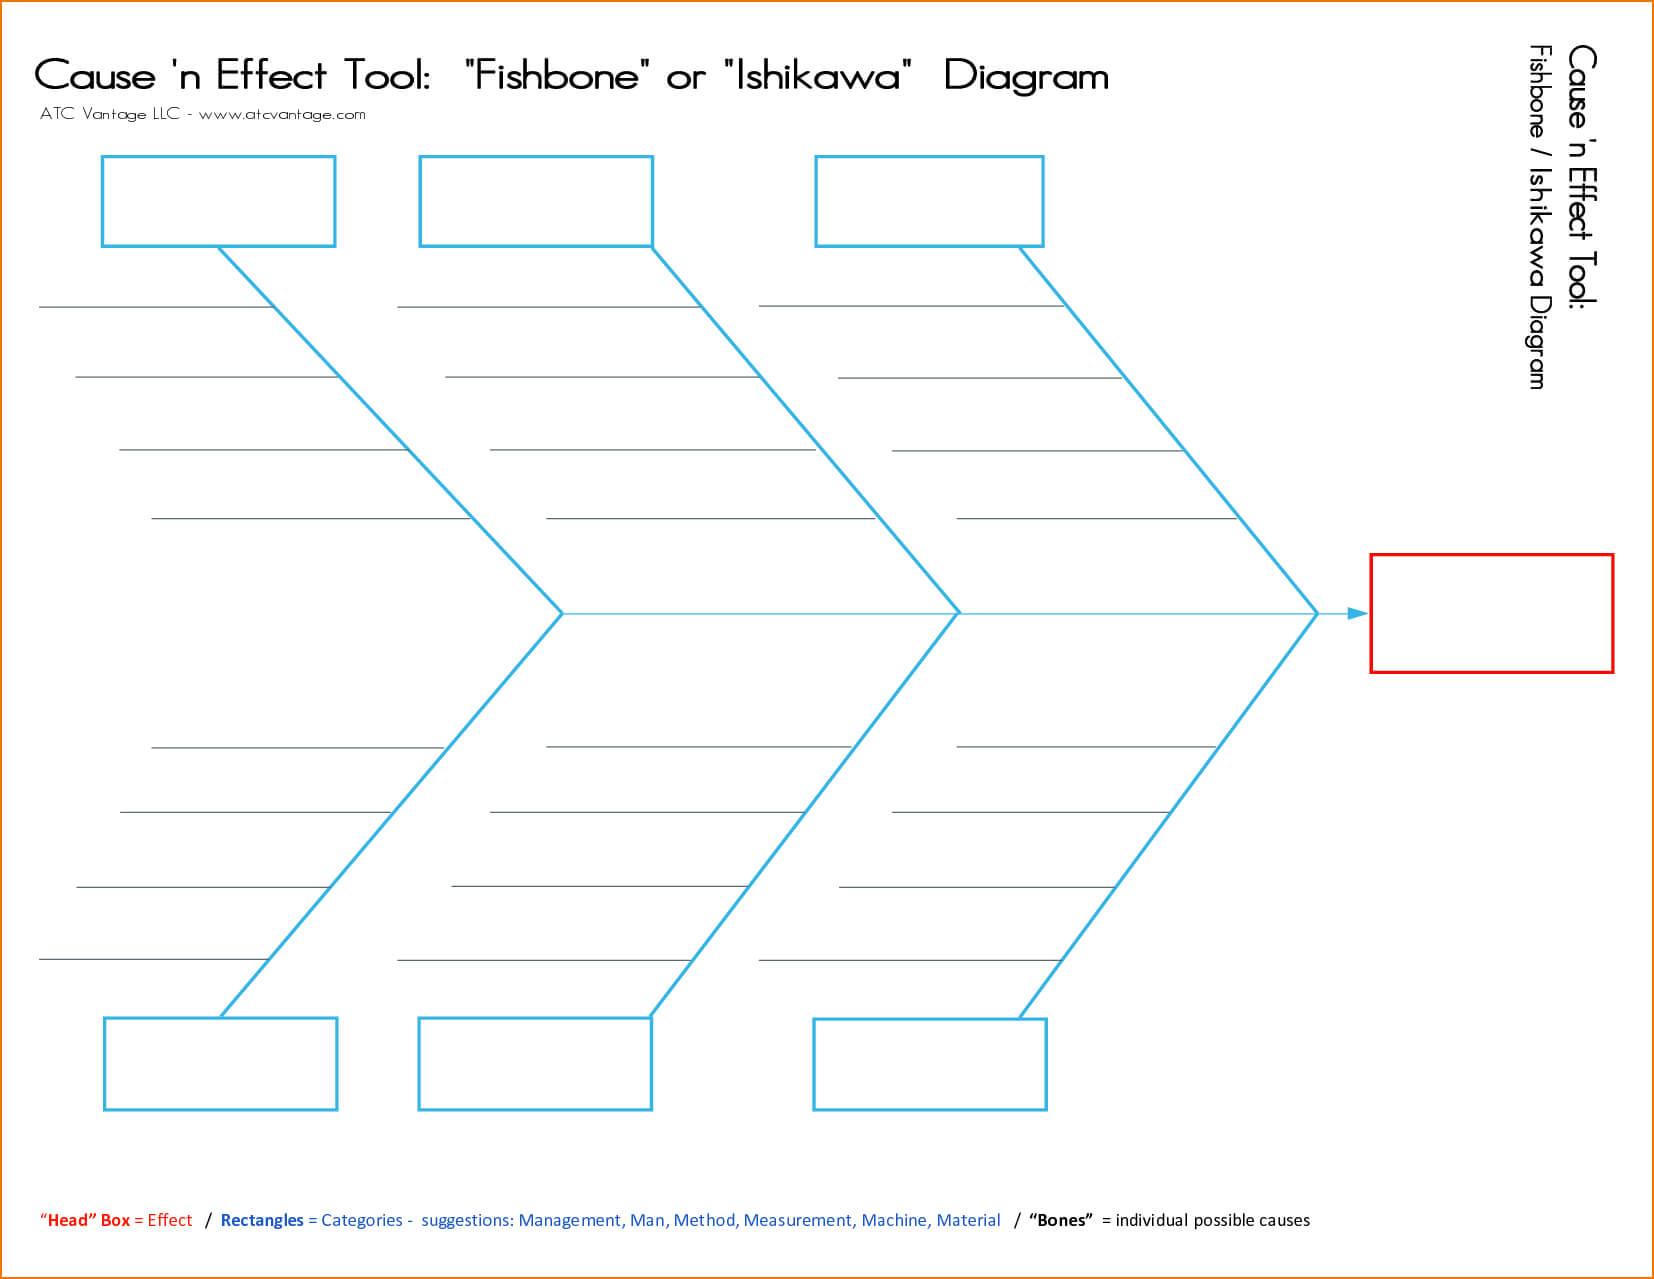 003 Template Ideas Cause And Effect Diagram Blank Shocking Regarding Blank Fishbone Diagram Template Word